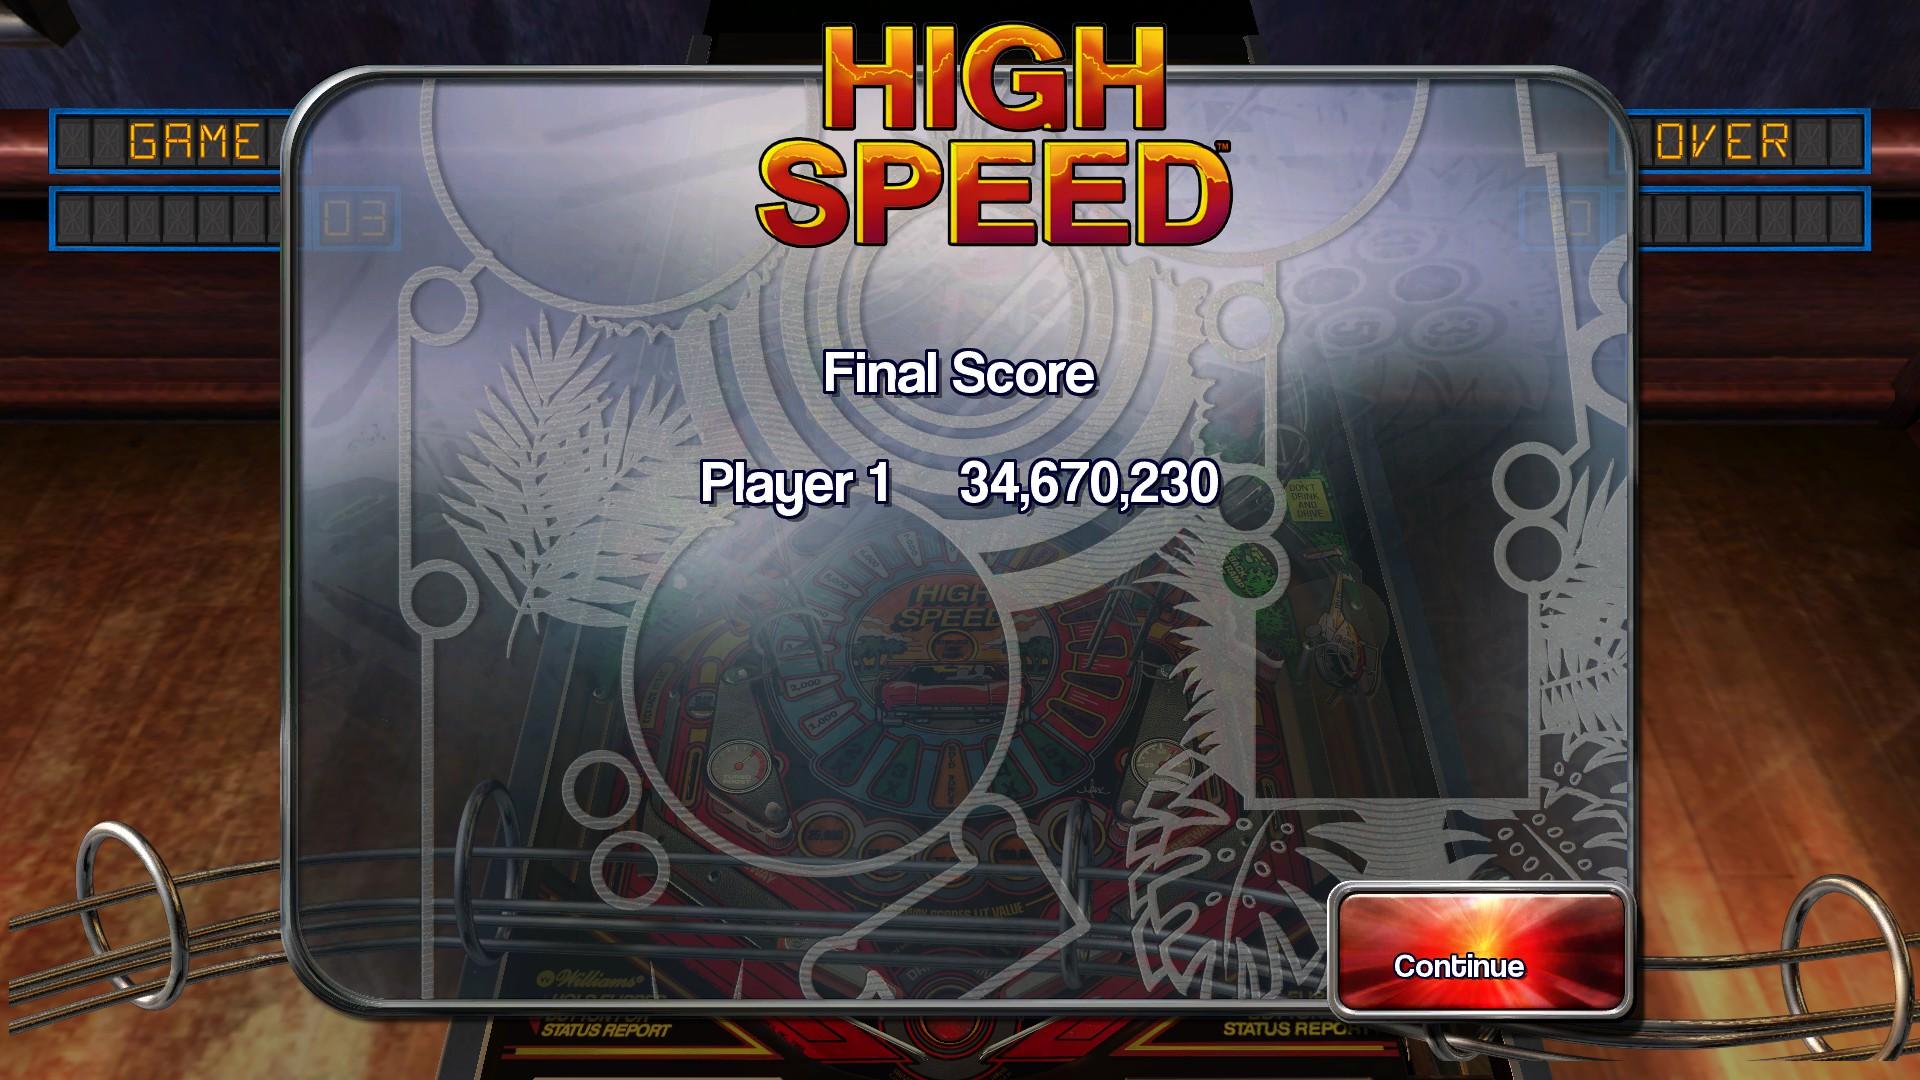 Pinball Arcade: High Speed 34,670,230 points